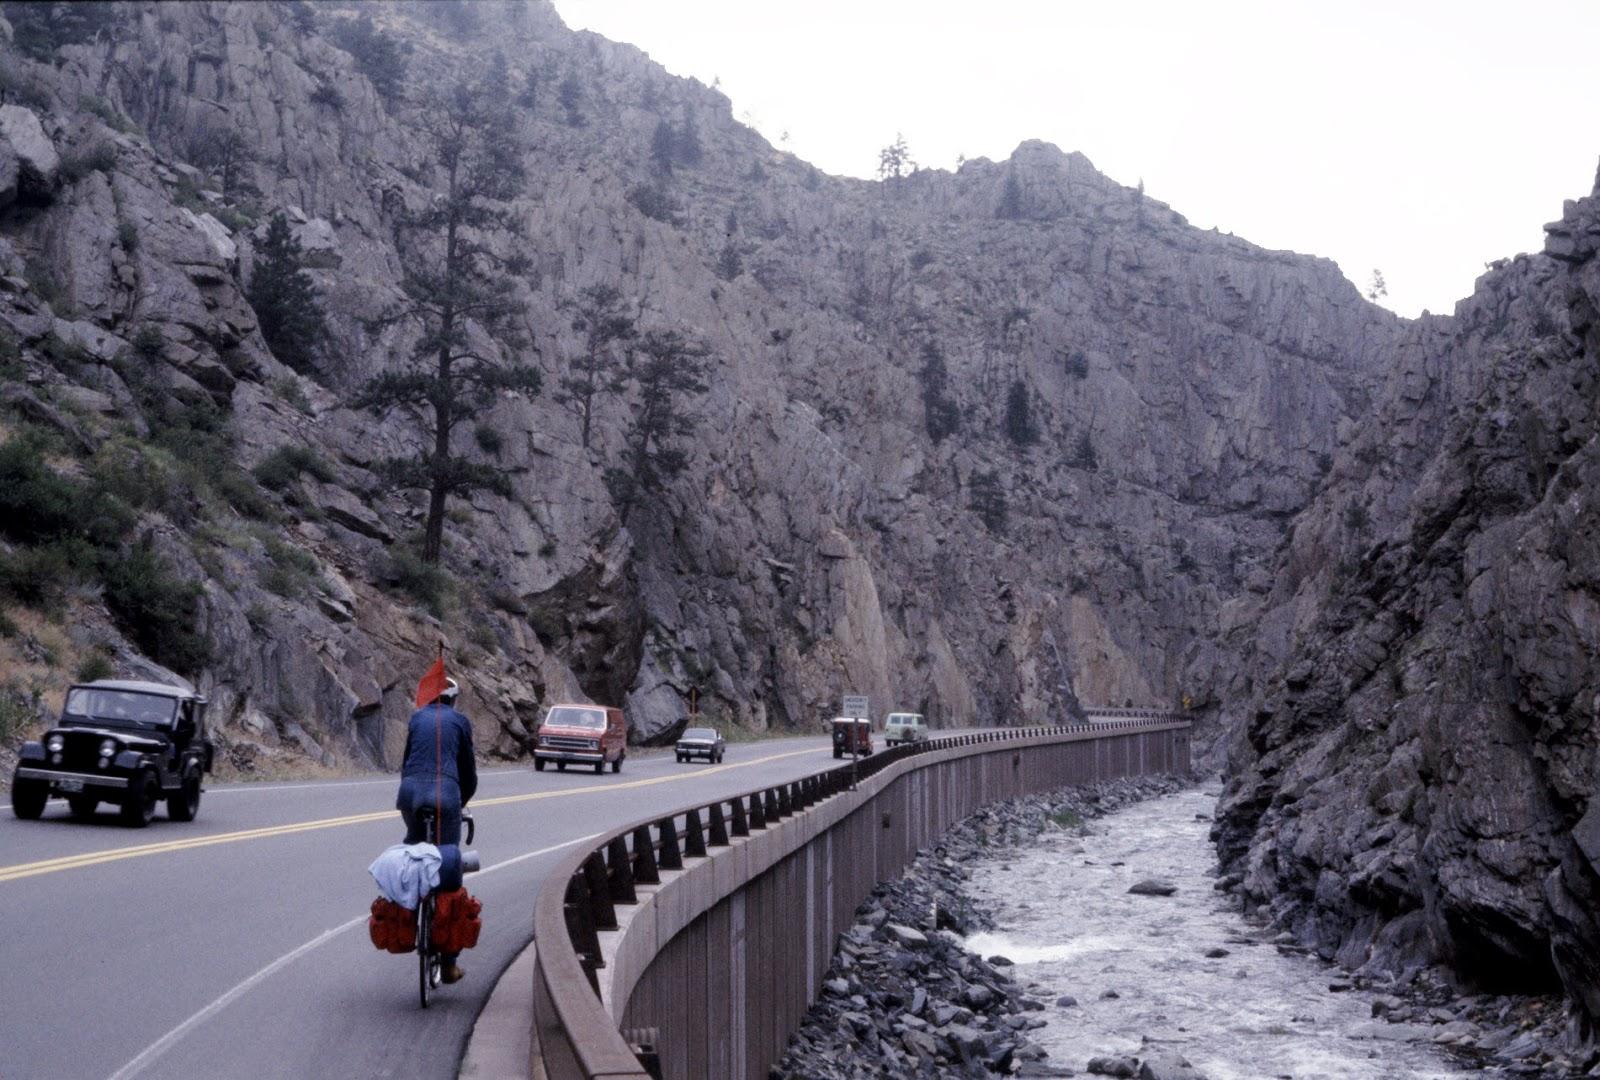 Cycling through the canyon